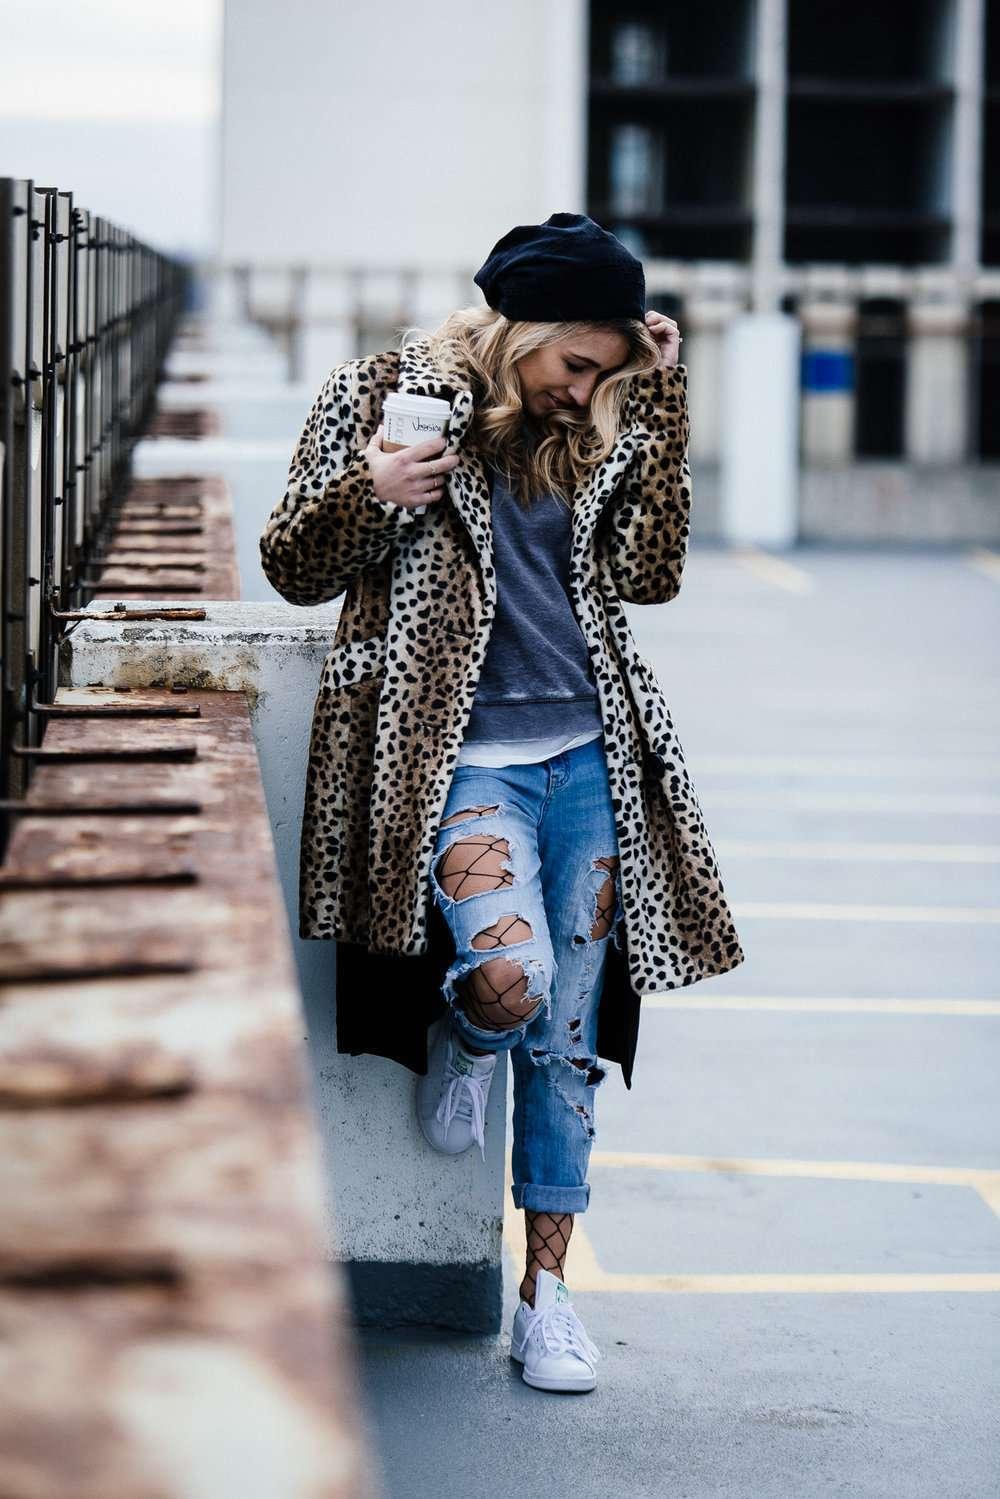 Calze a rete sotto i jeans